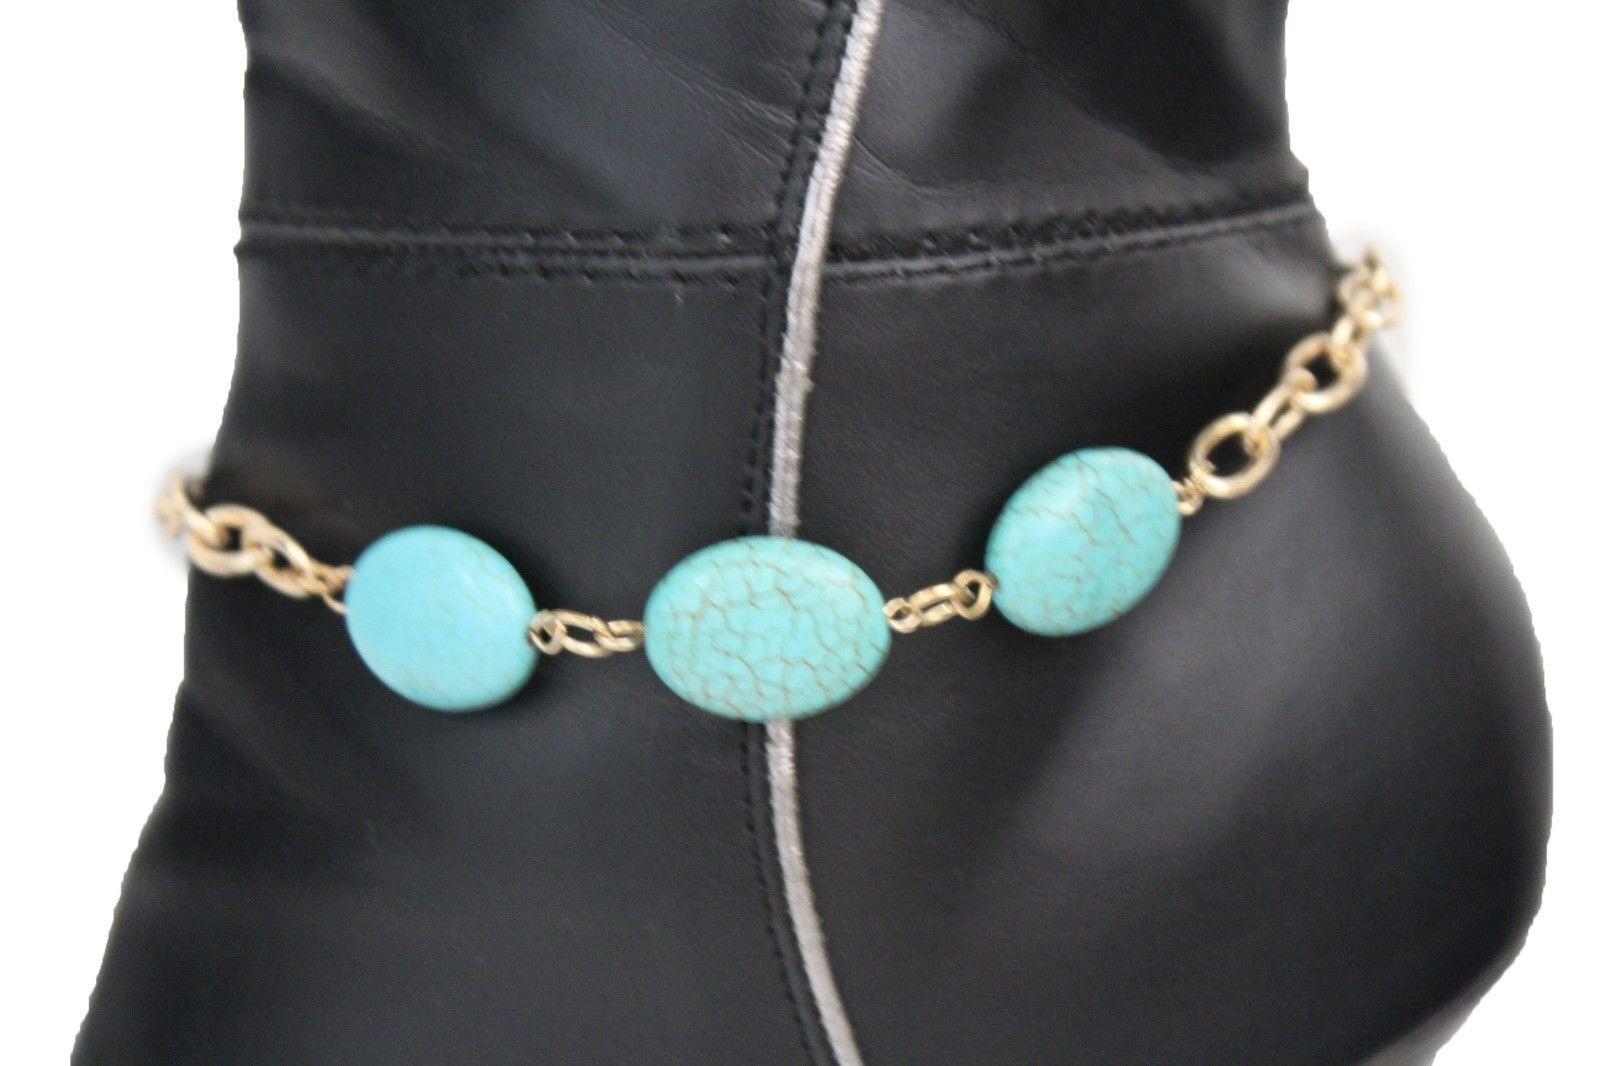 Women Boot Bracelet Antique Gold Metal Chains Bling Anklet Shoe Charm Blue Beads